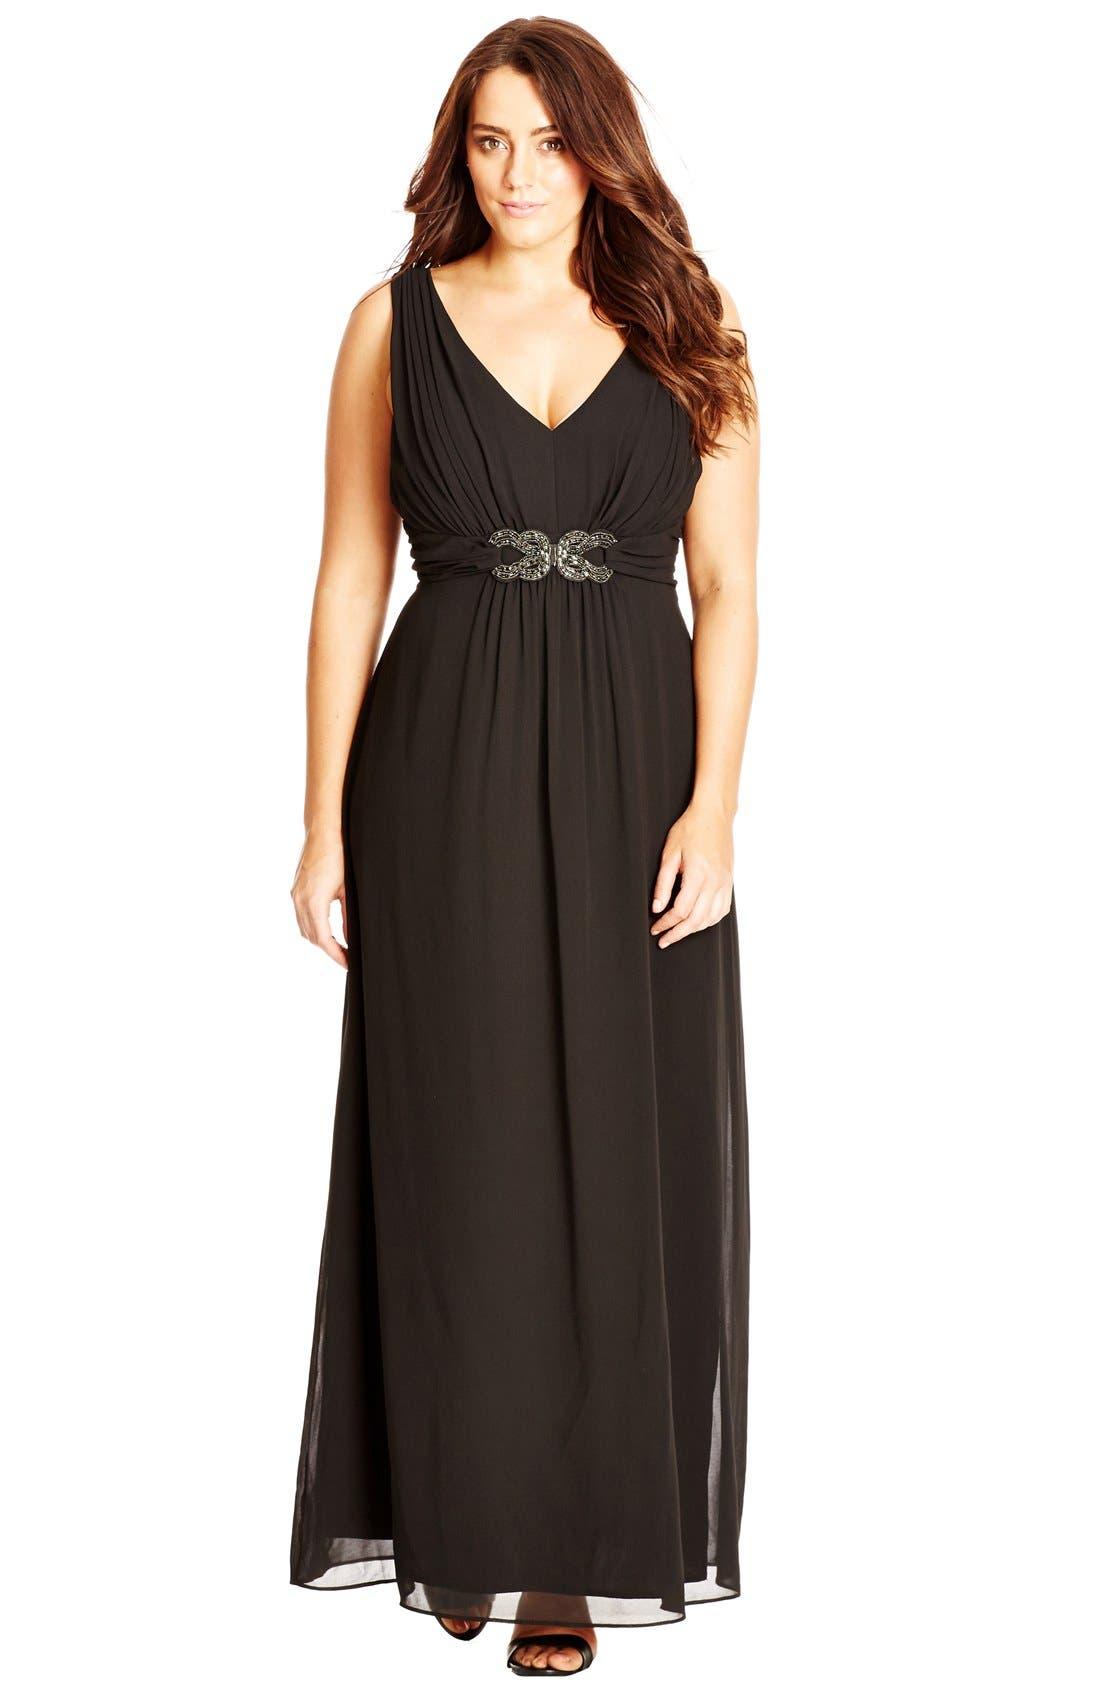 'Elegant Sparkle' Embellished Maxi Dress,                             Alternate thumbnail 3, color,                             001